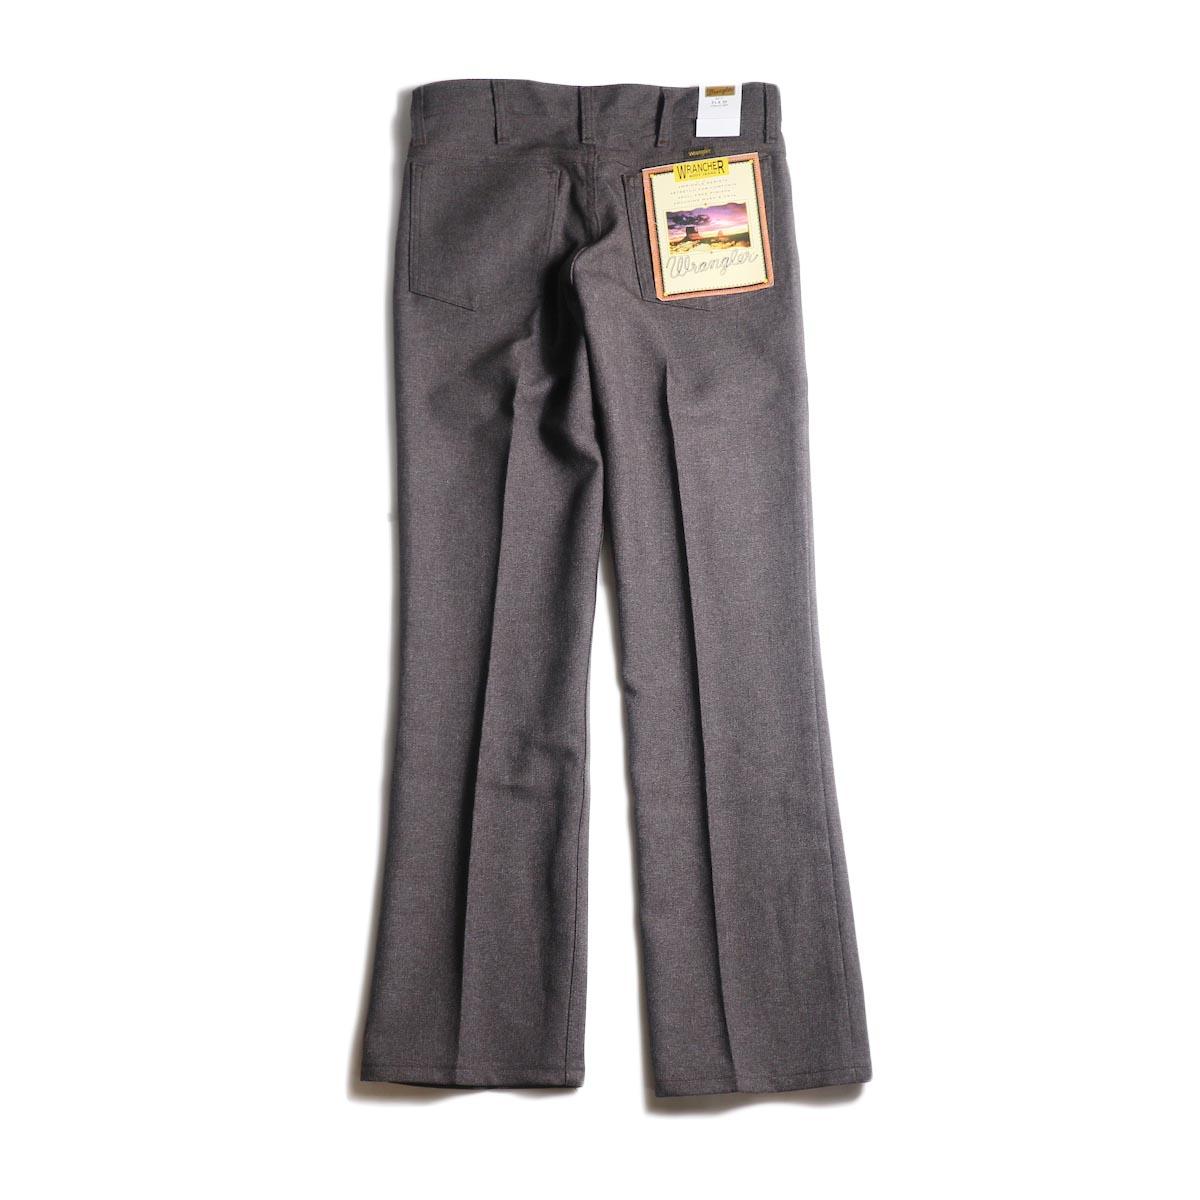 Wrangler / WRANCHER DRESS JEANS (H.Darkchoco)背面